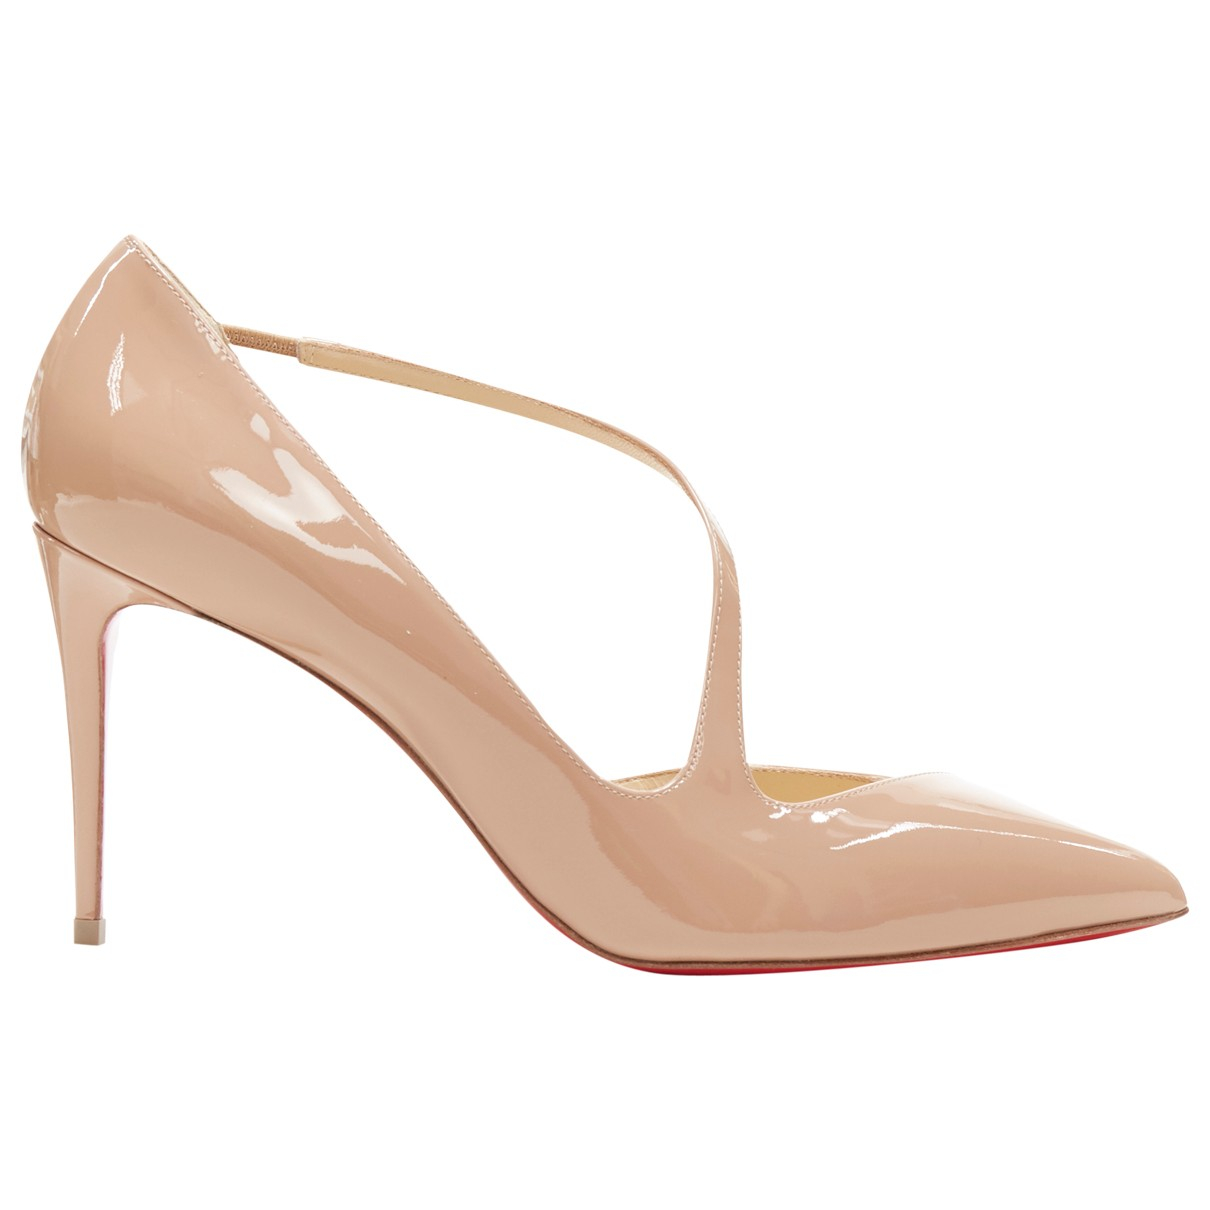 Christian Louboutin \N Beige Patent leather Heels for Women 40.5 EU